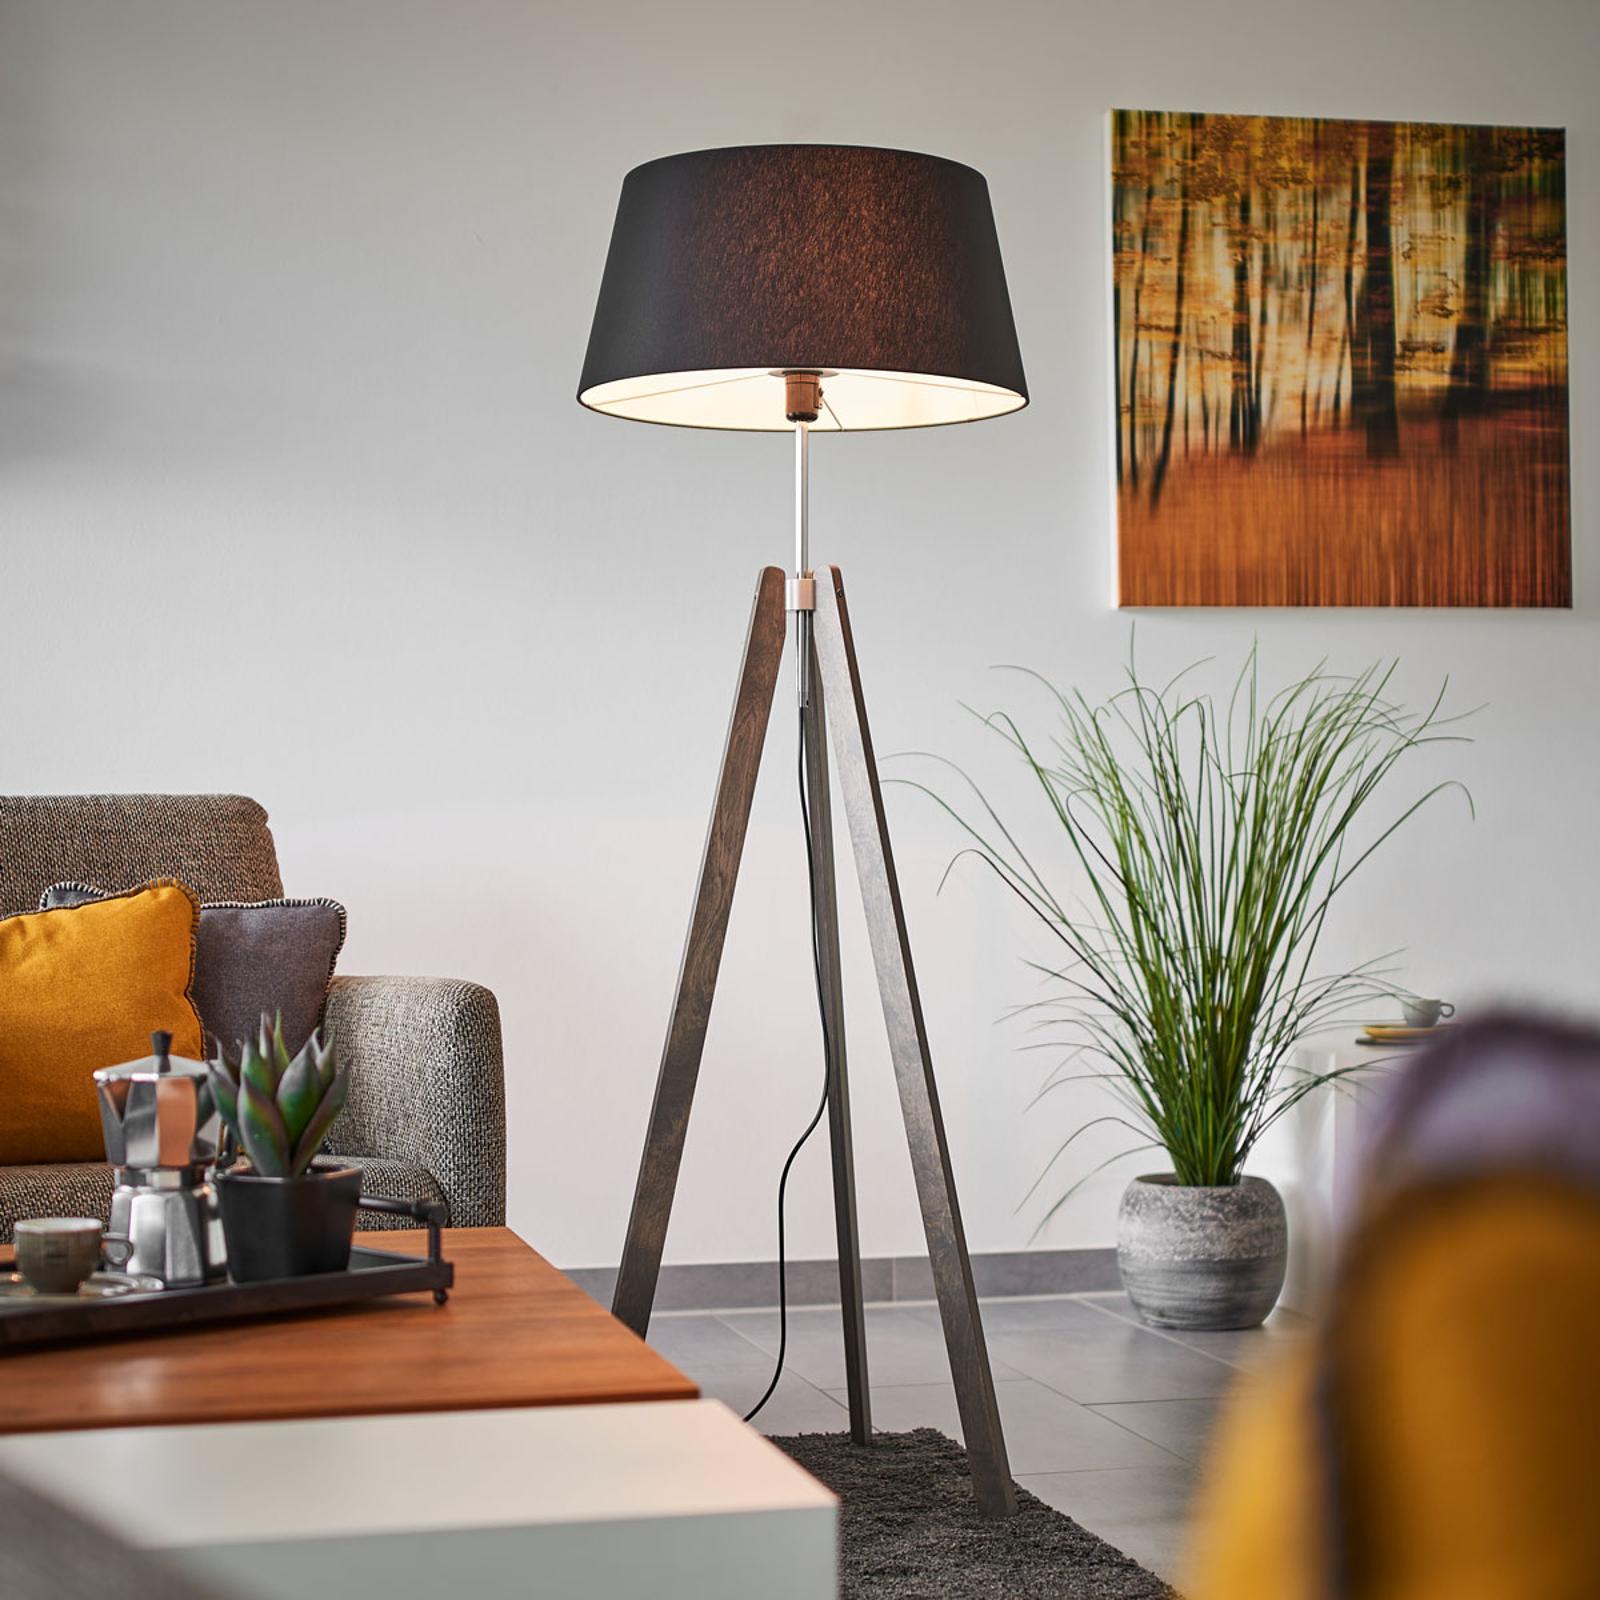 Thea - vloerlamp van hout m. zwarte chintz kap